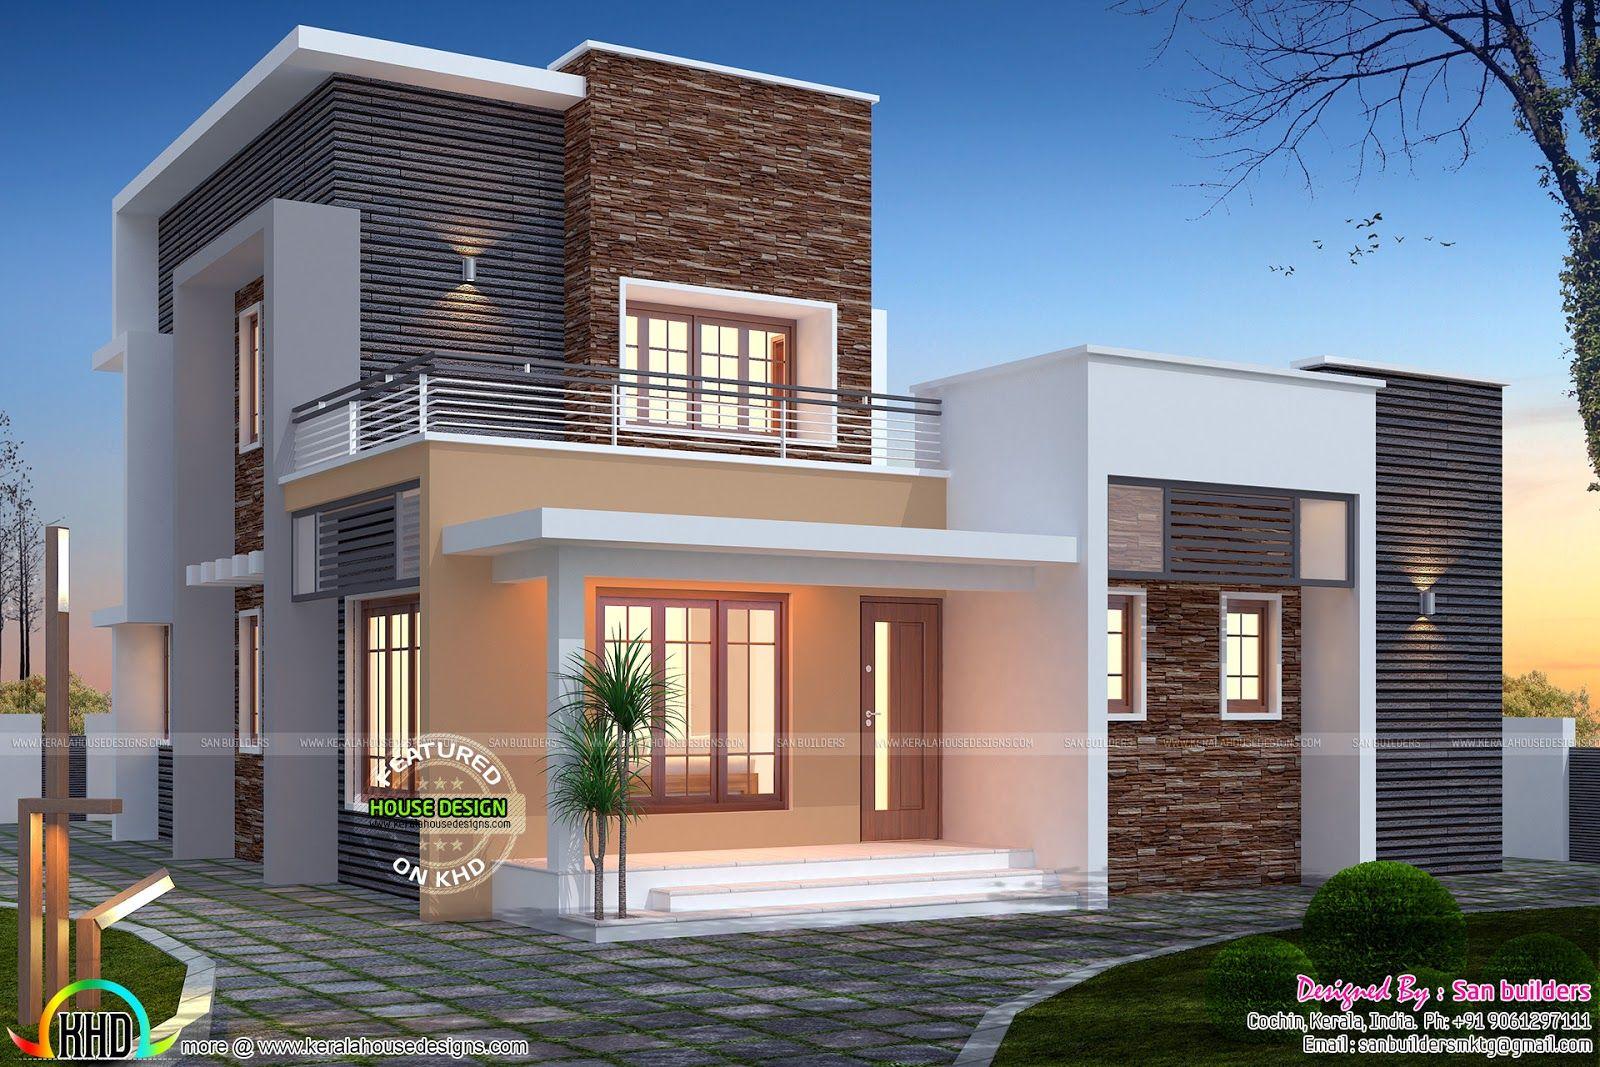 1516-sq-ft-house.jpg (1600×1067) | Arquitectura | Pinterest